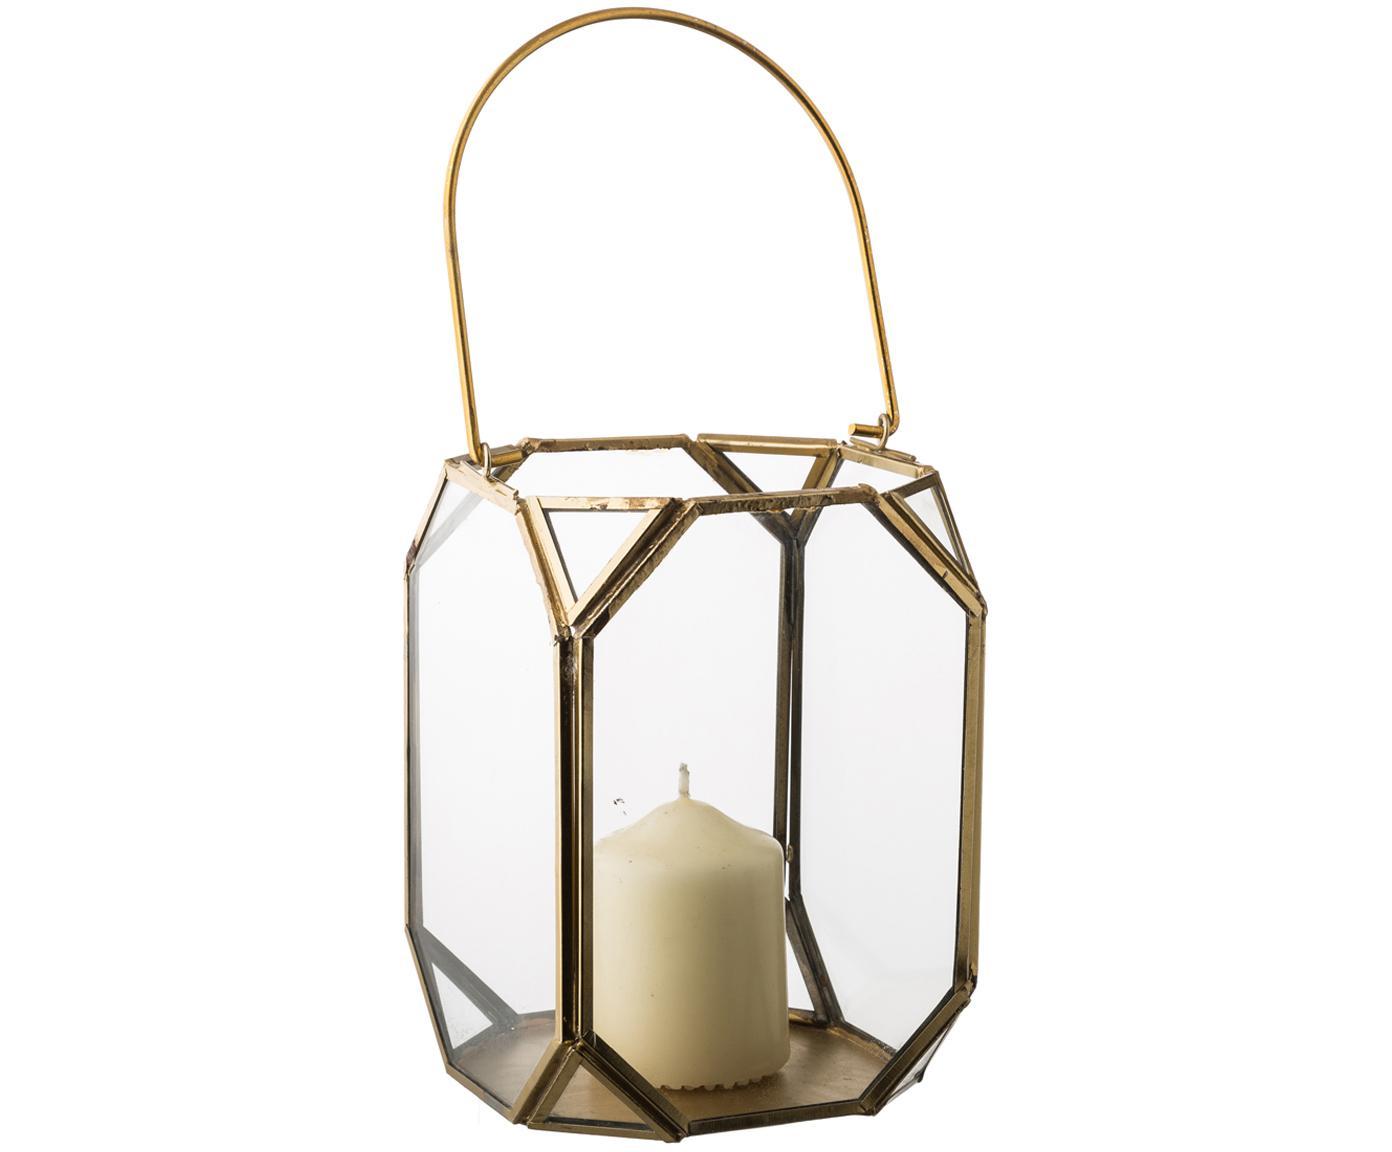 Lanterna portacandela in vetro e ottone Ginny, Struttura: metallo rivestito, Ottonato, Larg. 11 x Alt. 15 cm